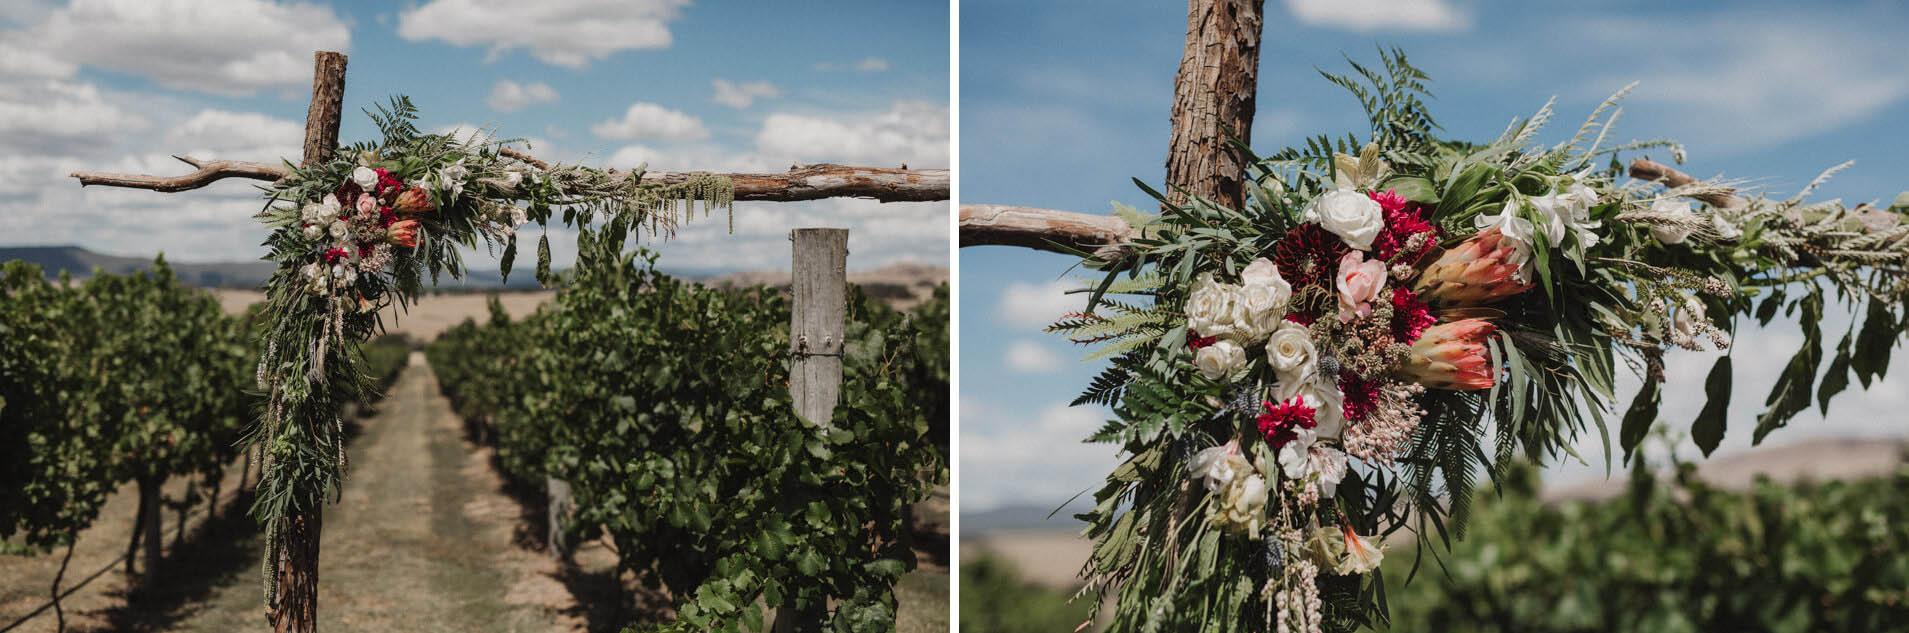 suger-pine-walk-wedding (Corinna & Dylan)_073(0858)2.jpg